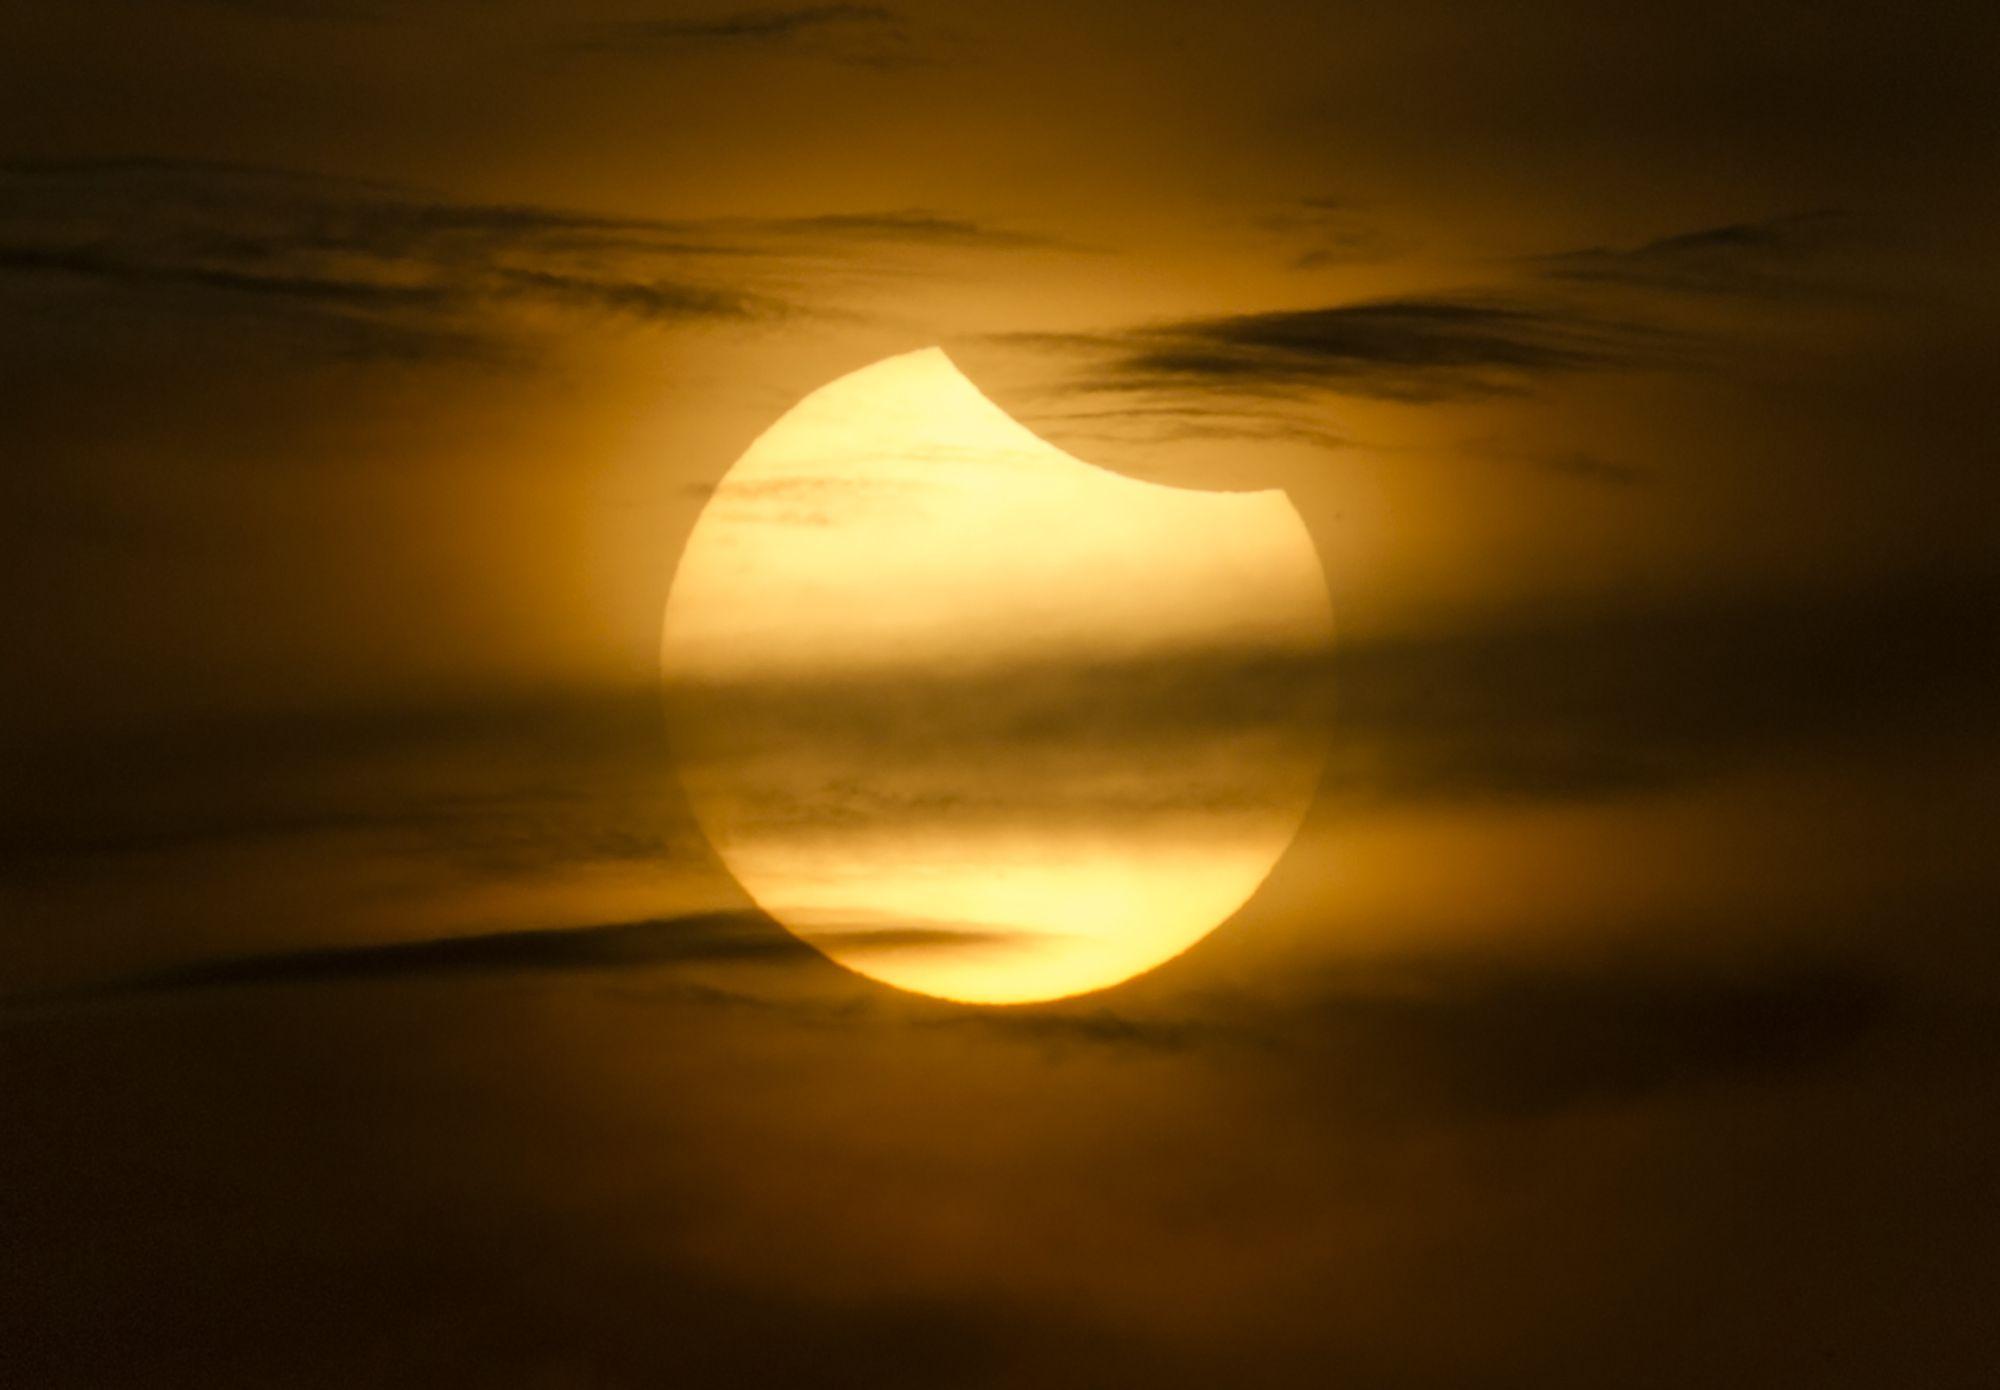 lunar eclipse july 2019 astrology